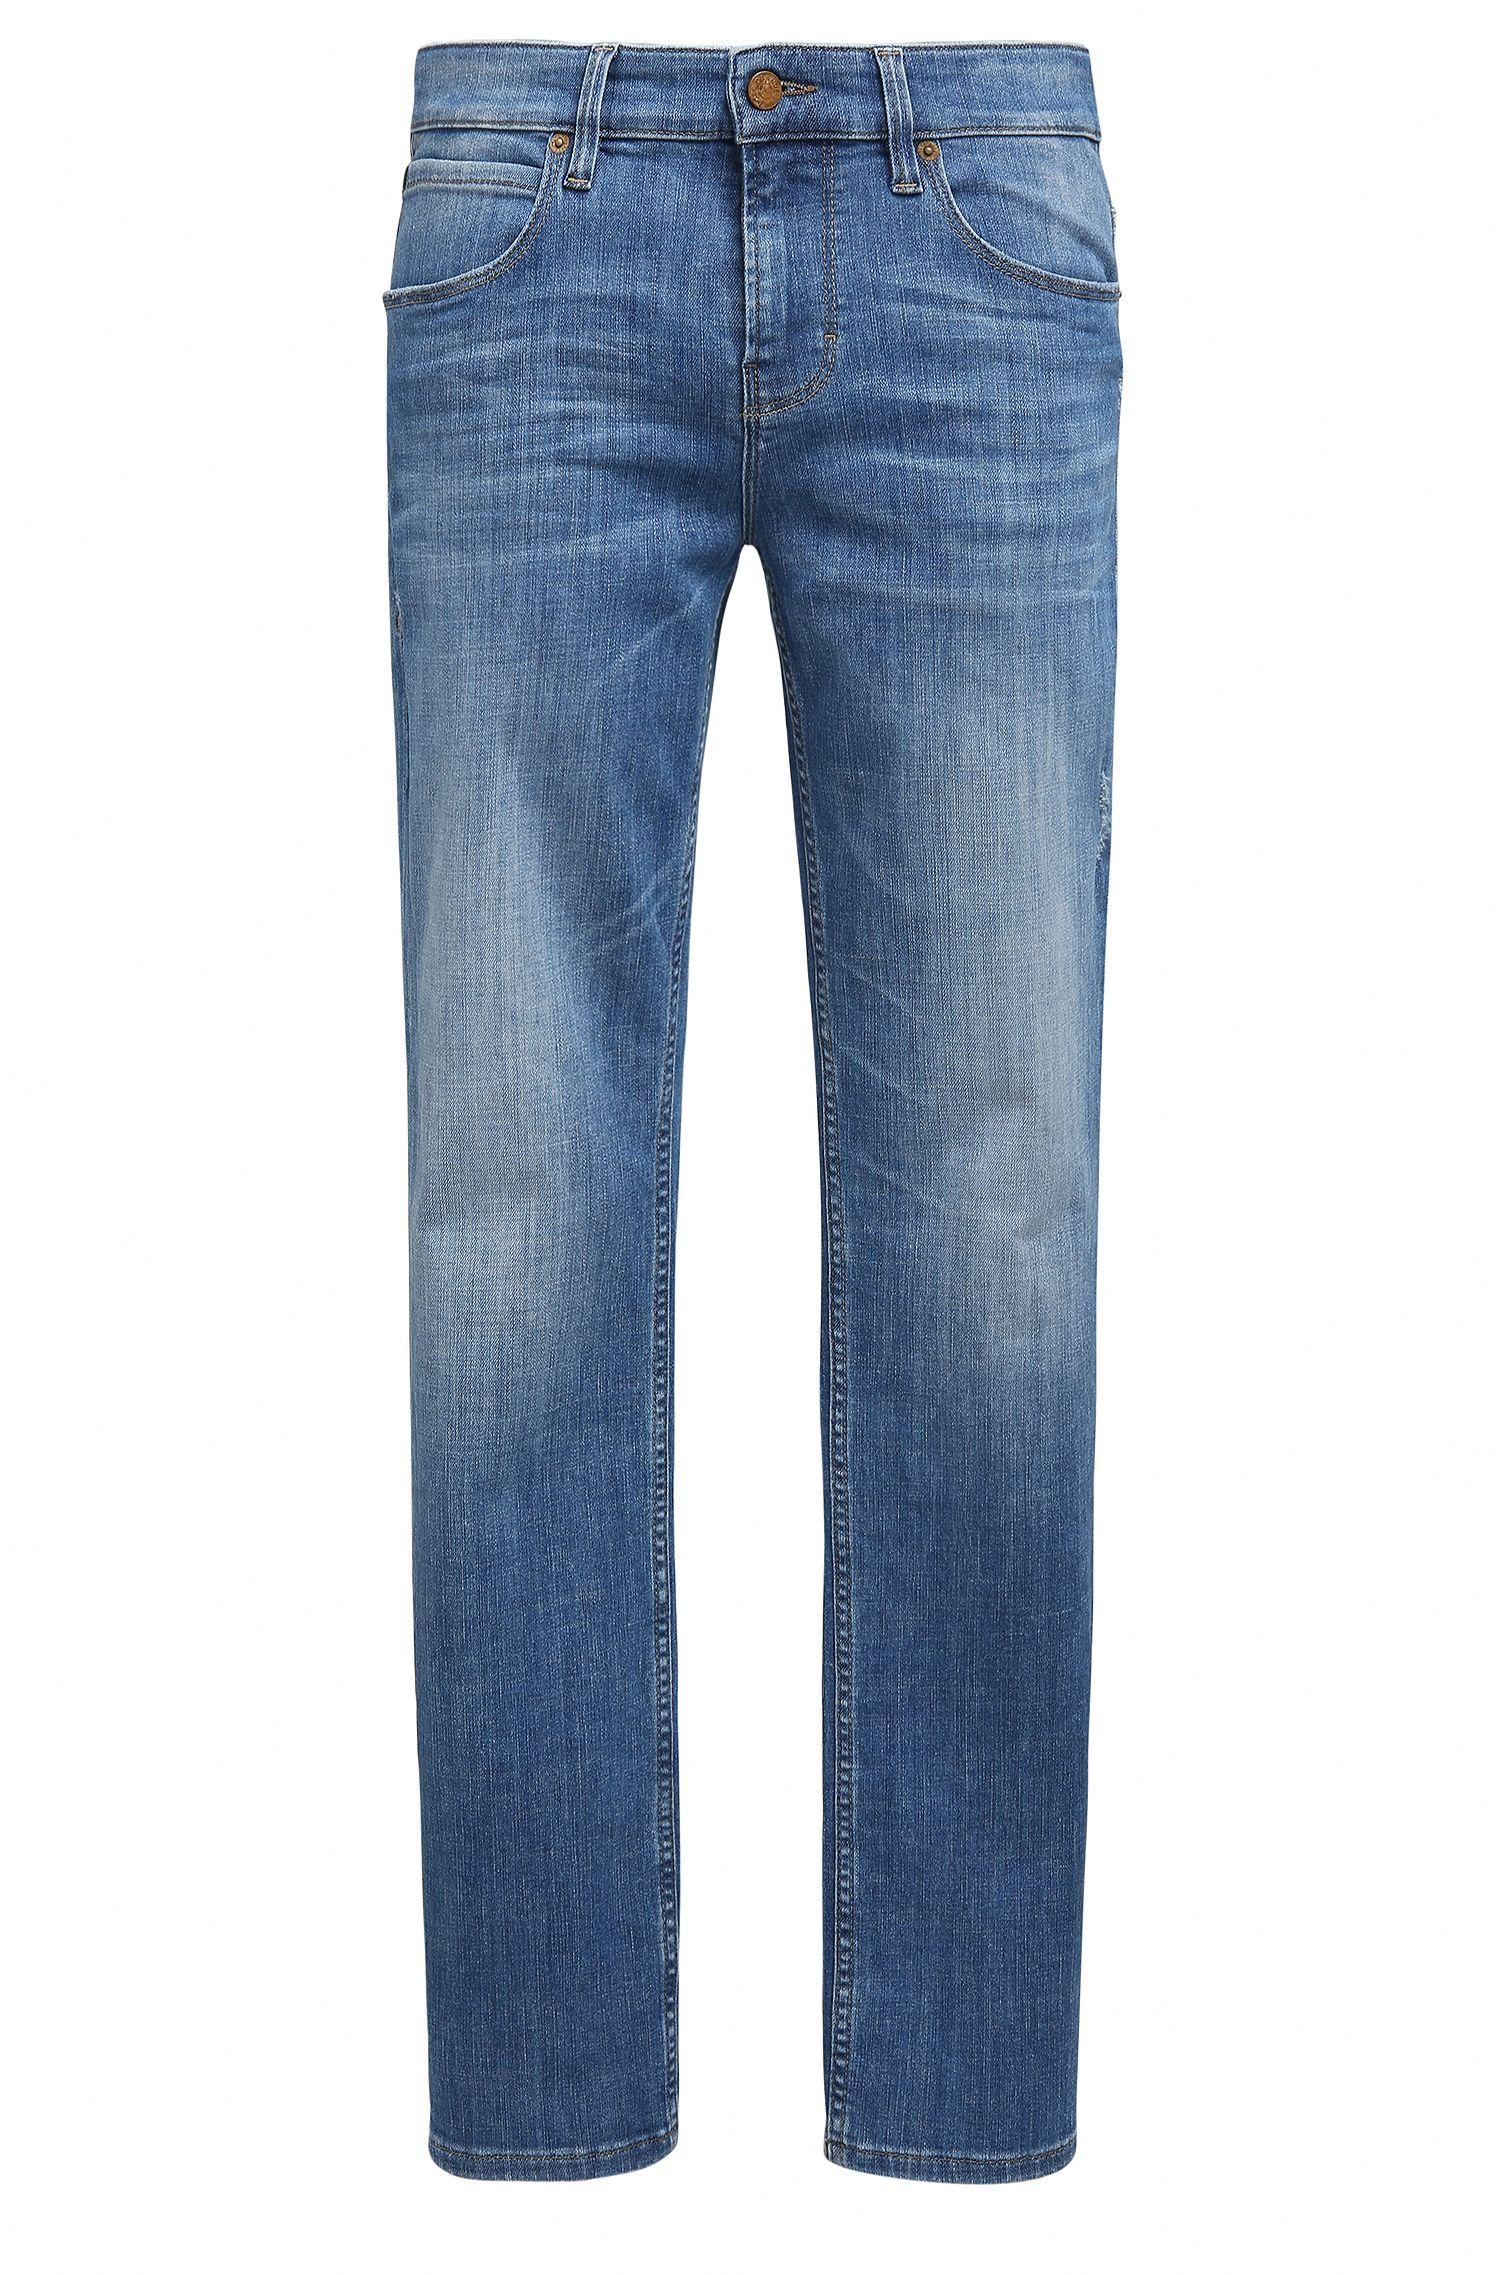 Stone Wash Stretch Cotton Jeans, Slim Leg | Orange63